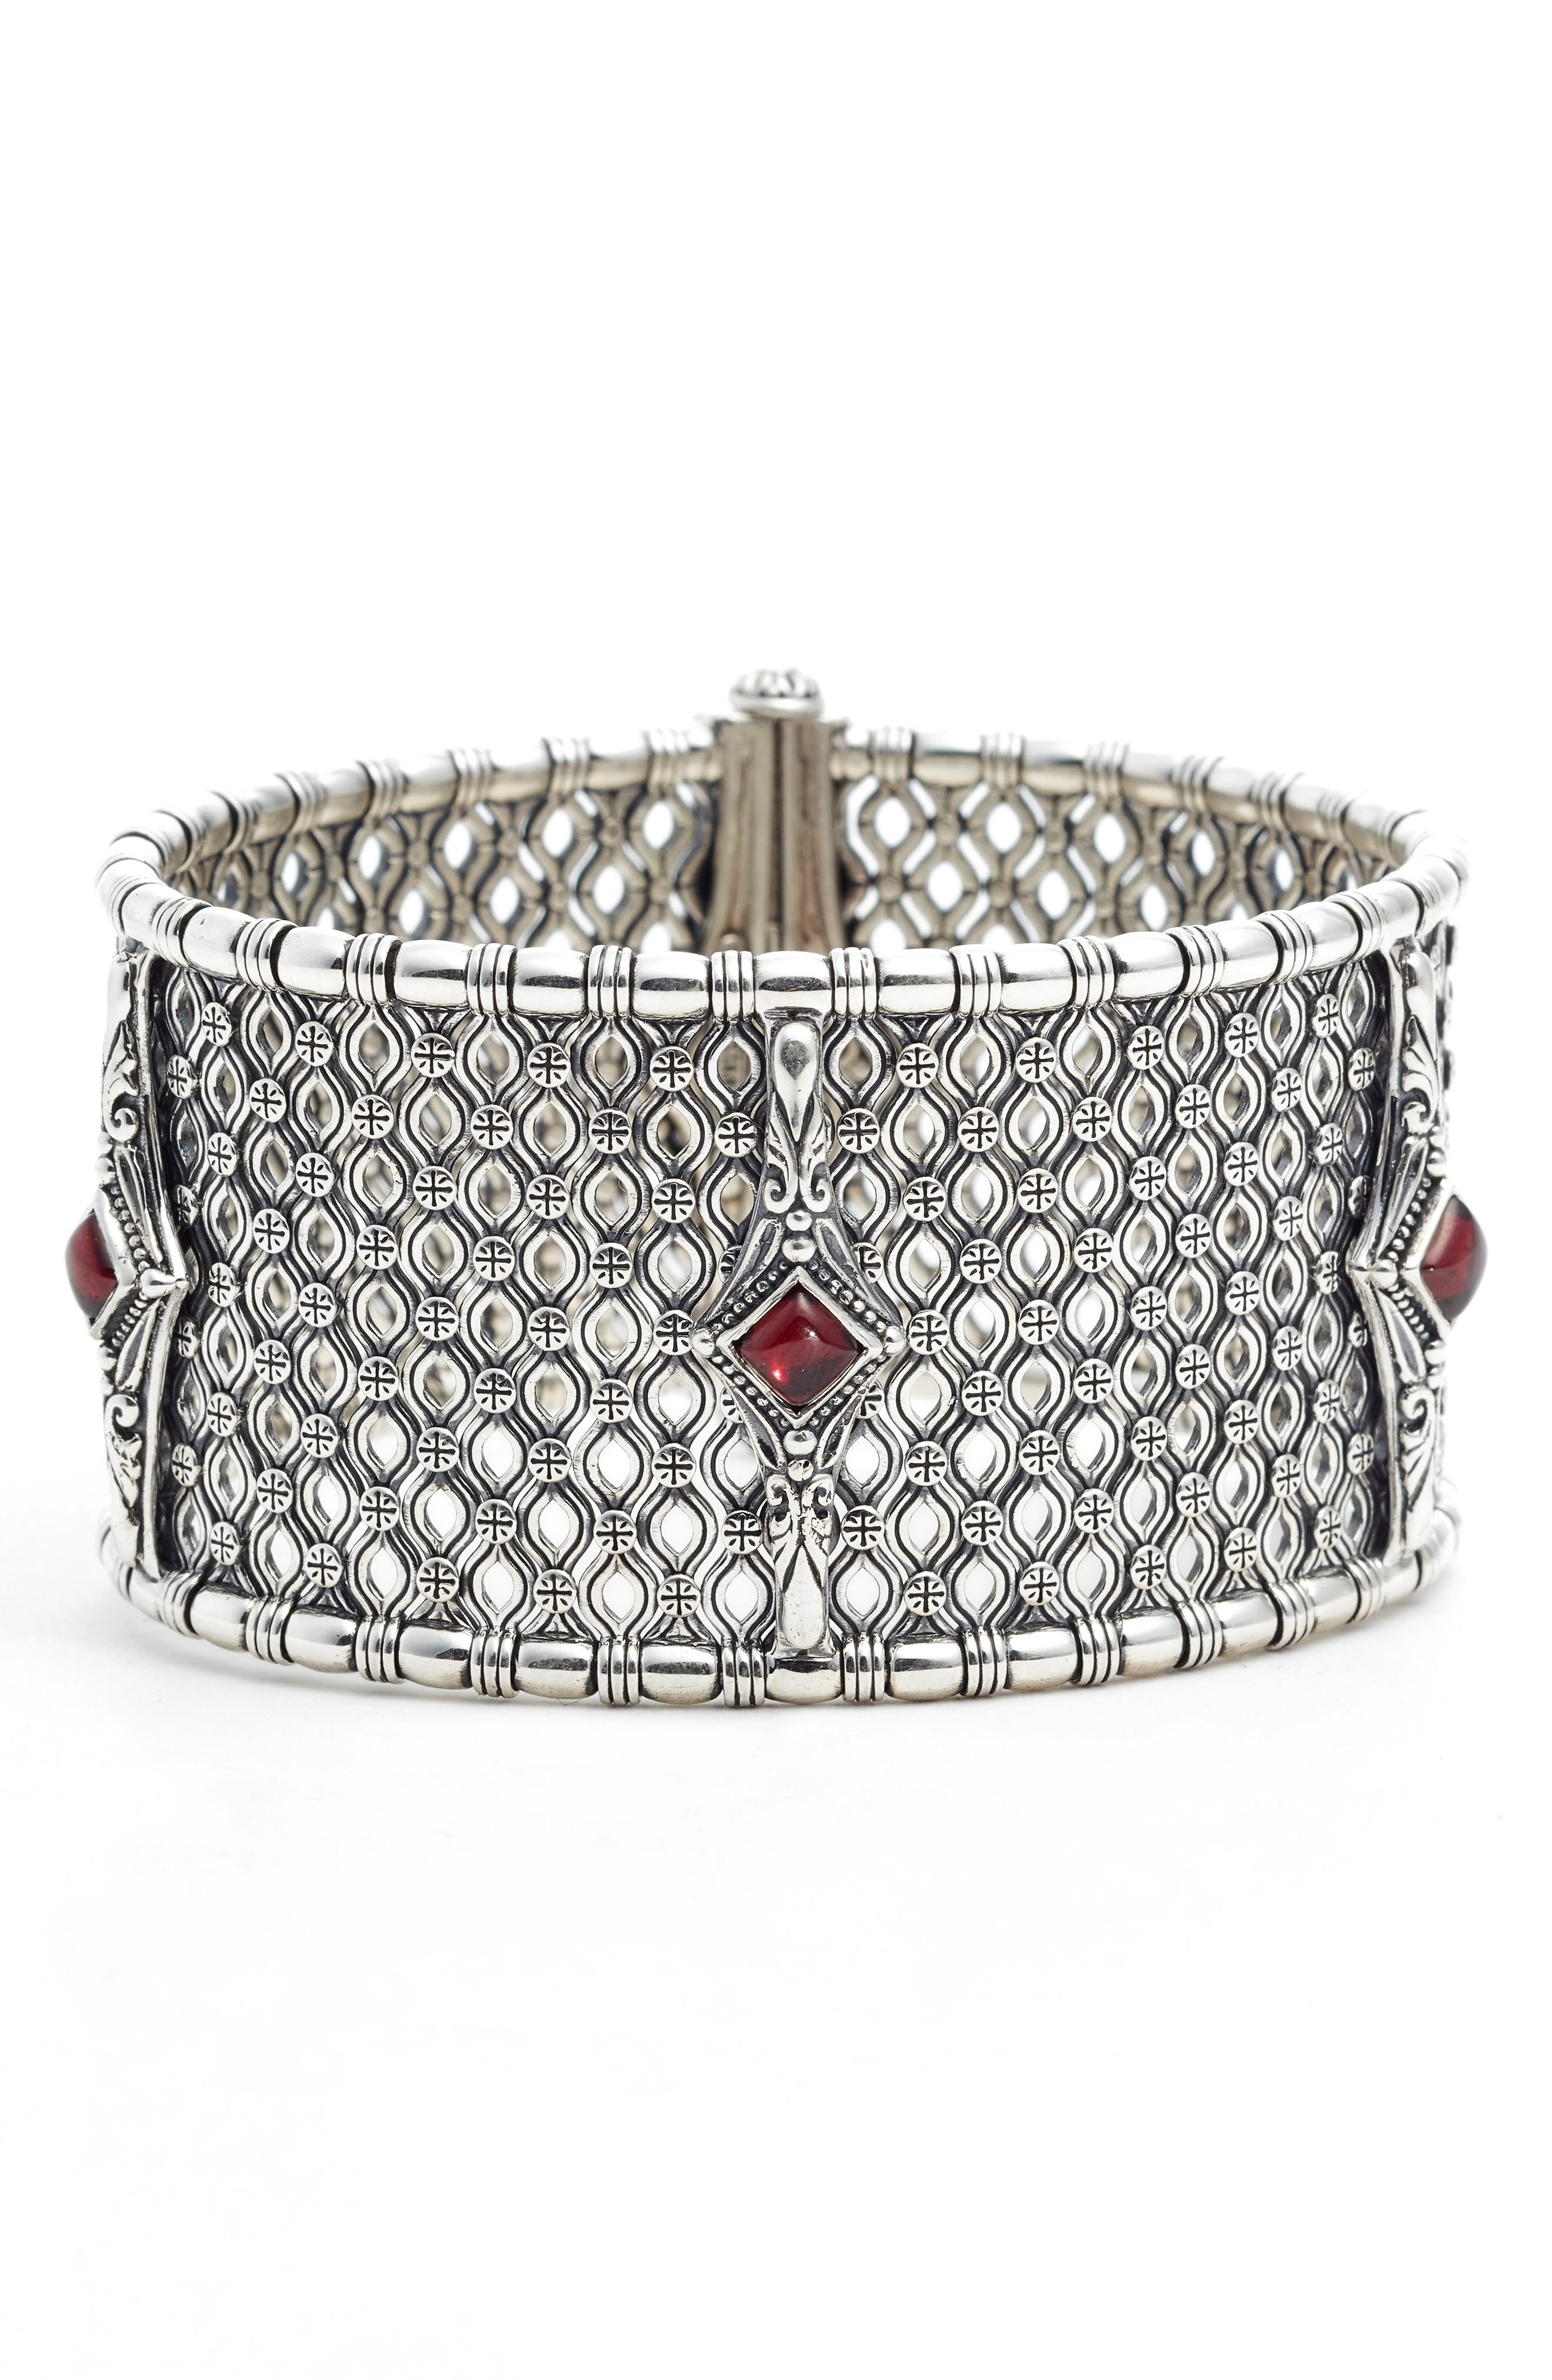 Etched Silver & Rhodolite Garnet Cuff Bracelet,                             Main thumbnail 1, color,                             Silver/ Gold/ White